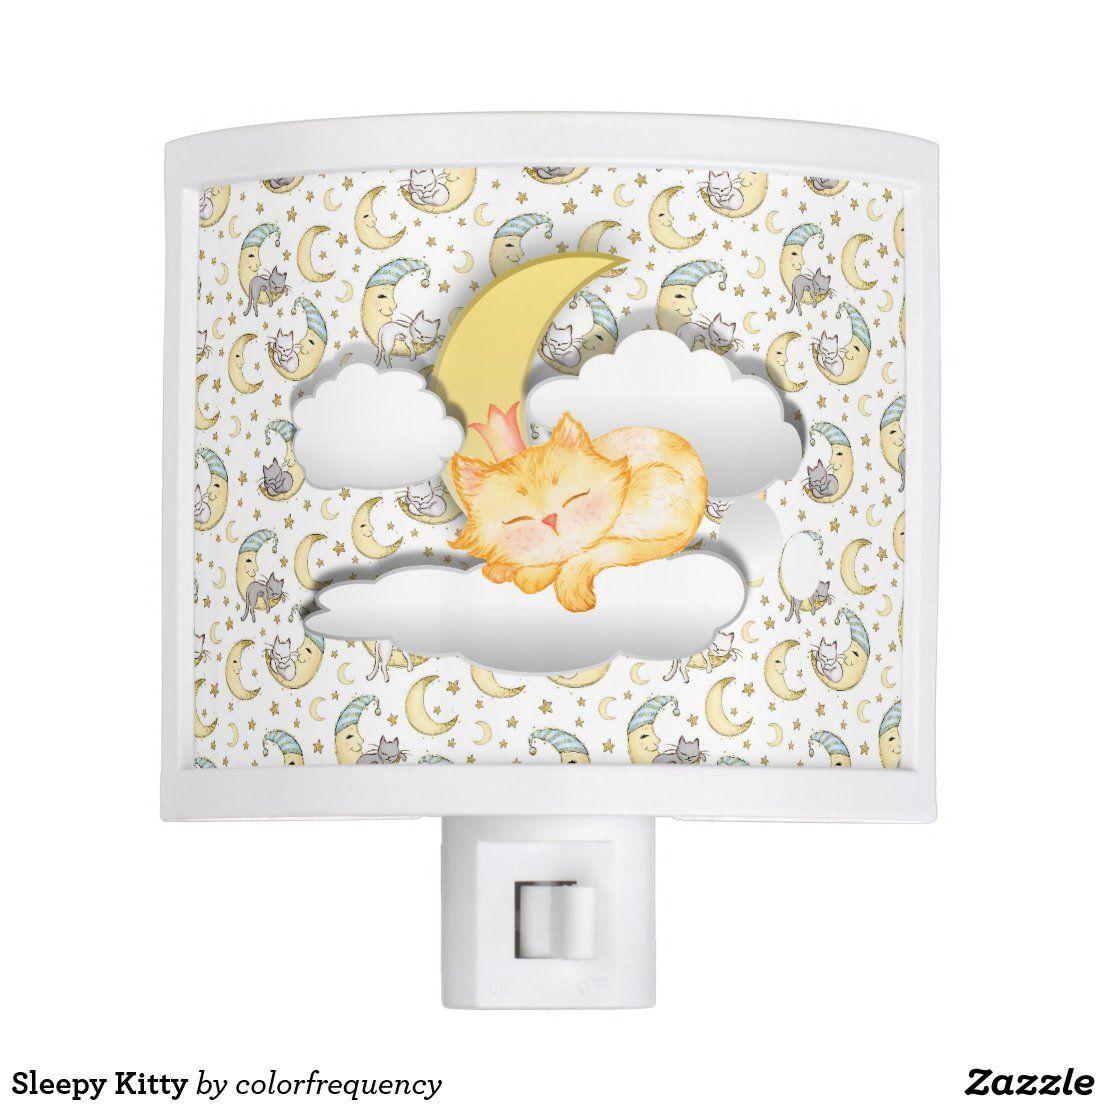 Sleepy Kitty Night Light | Zazzle.com